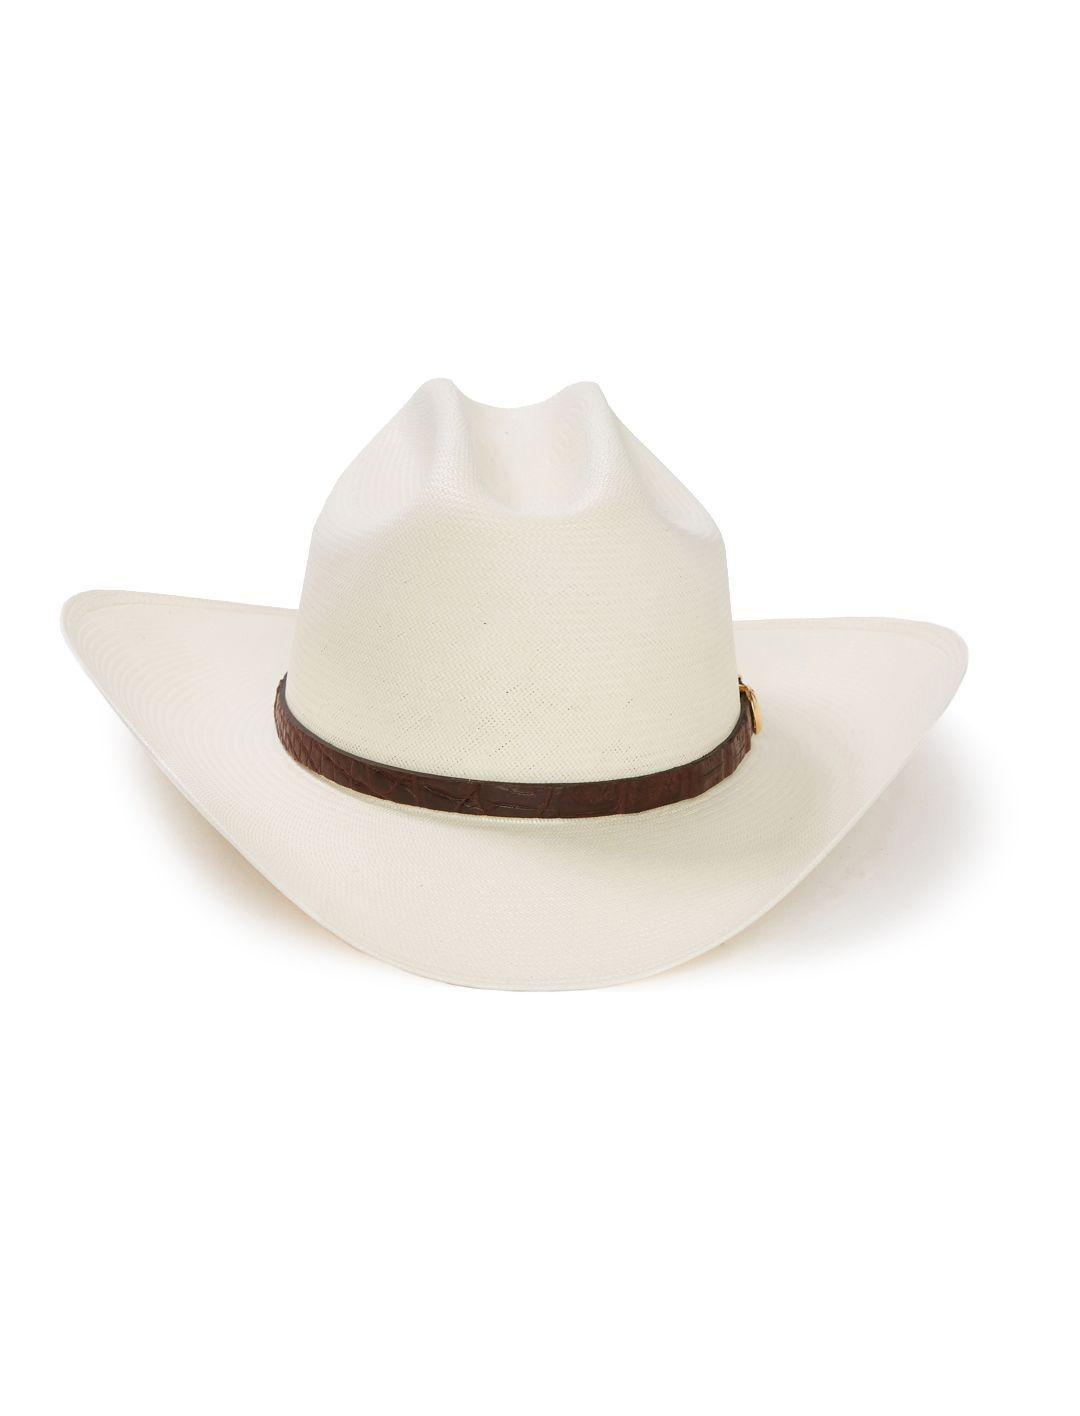 Stetson Men s Evilla De Oro 1000X Straw Cowboy Hat SSEVOR3140 1a775e32aa9